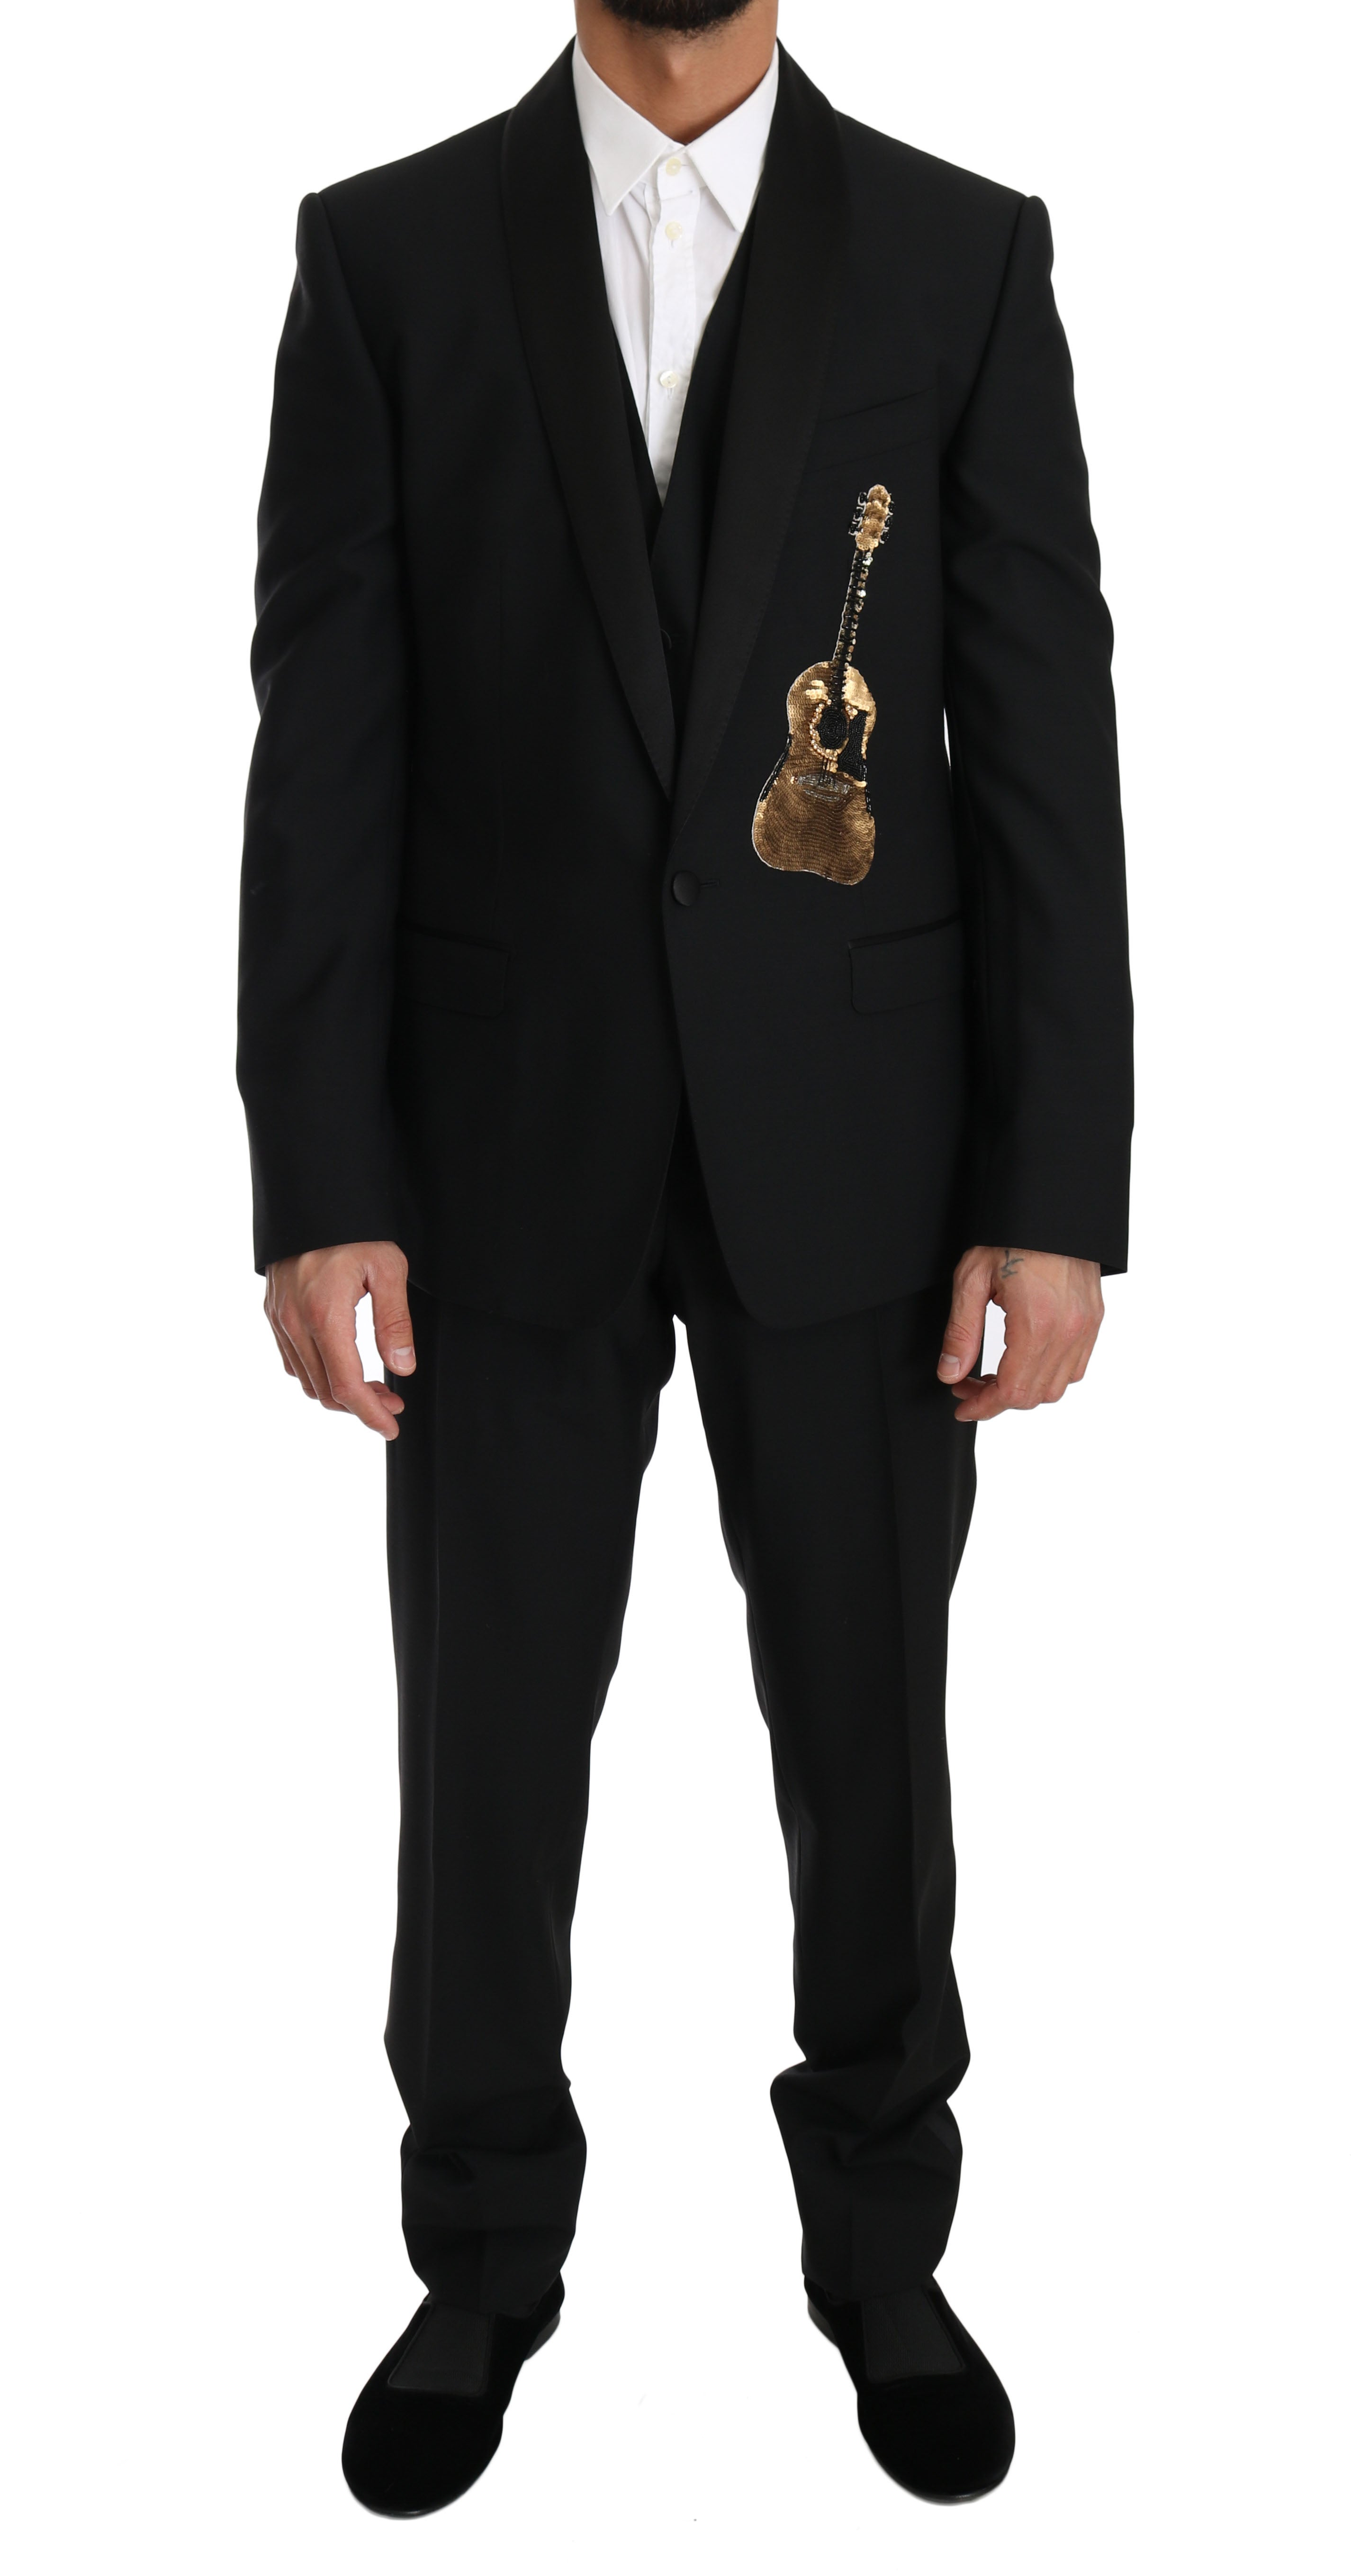 Dolce & Gabbana Black Wool 3 Piece Sequin Guitar Suit